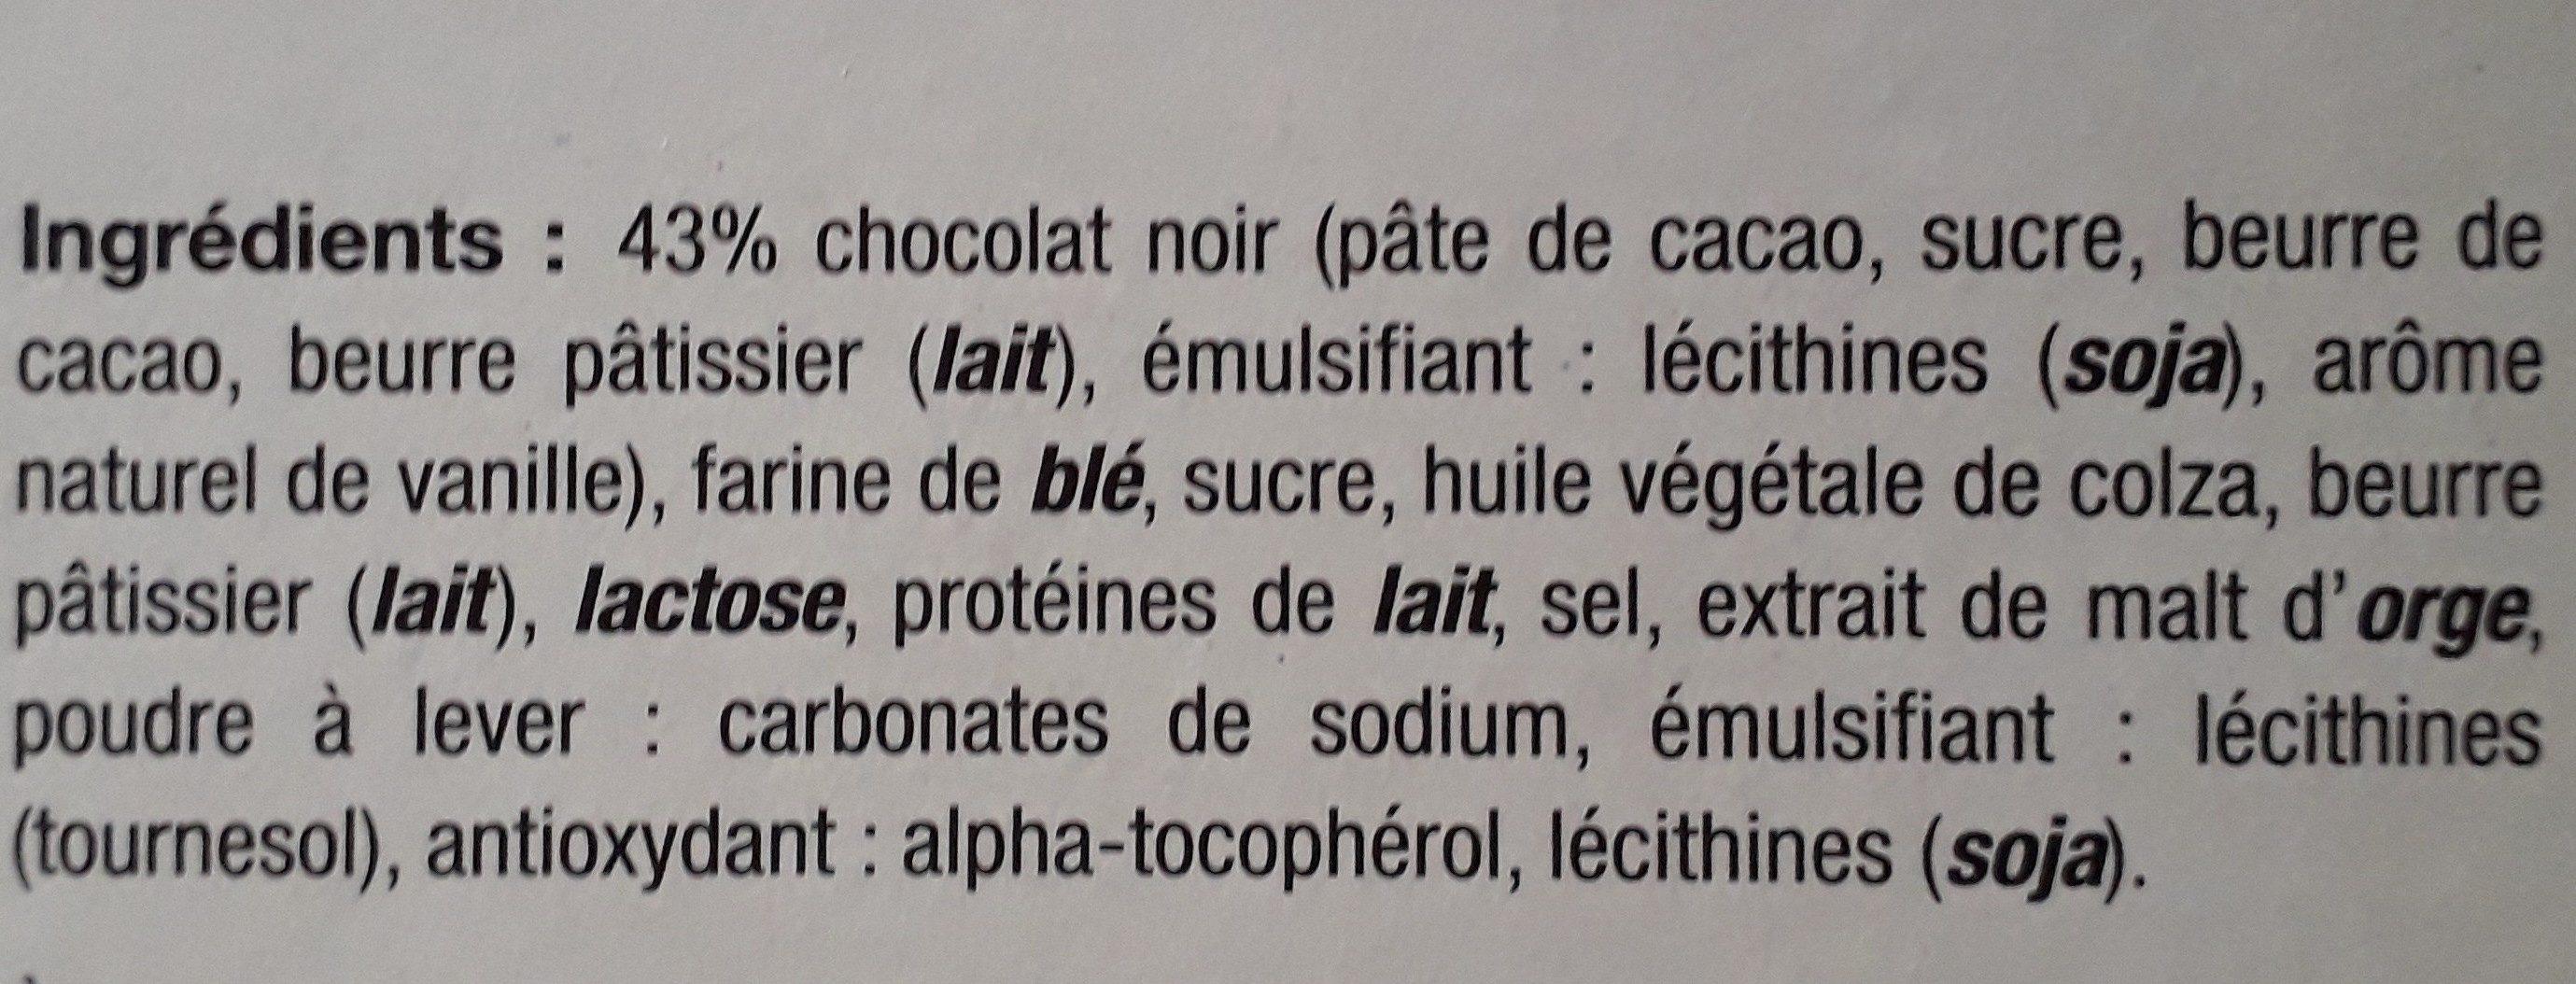 Crêpes dentelle Chocolat noir - Ingredients - fr